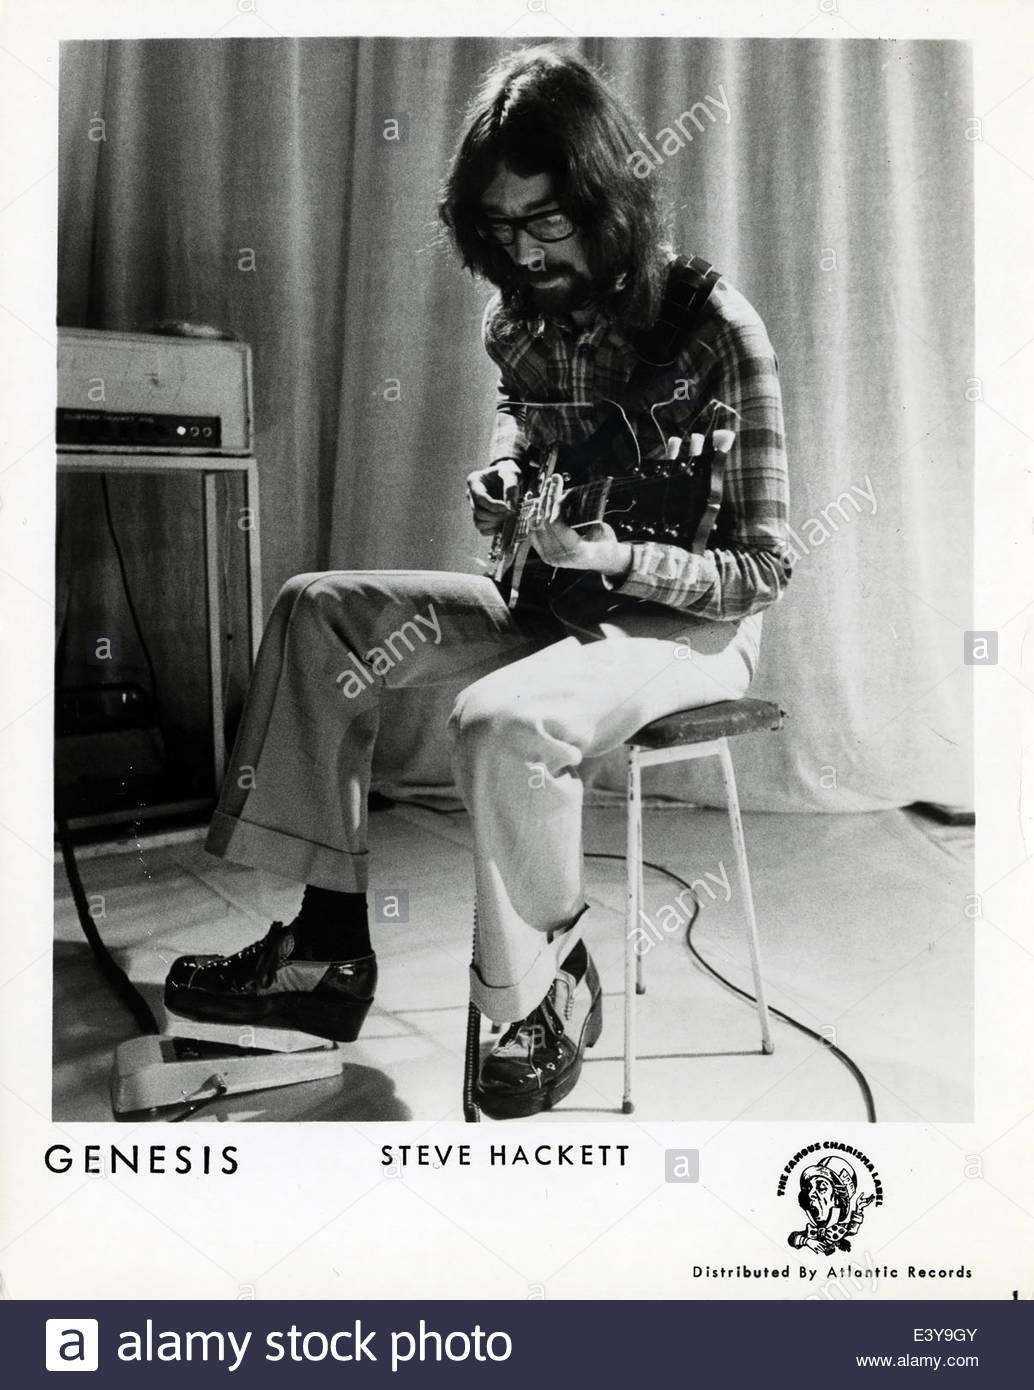 Steve Hackett of Genesis, circa 1970s - Stock Image